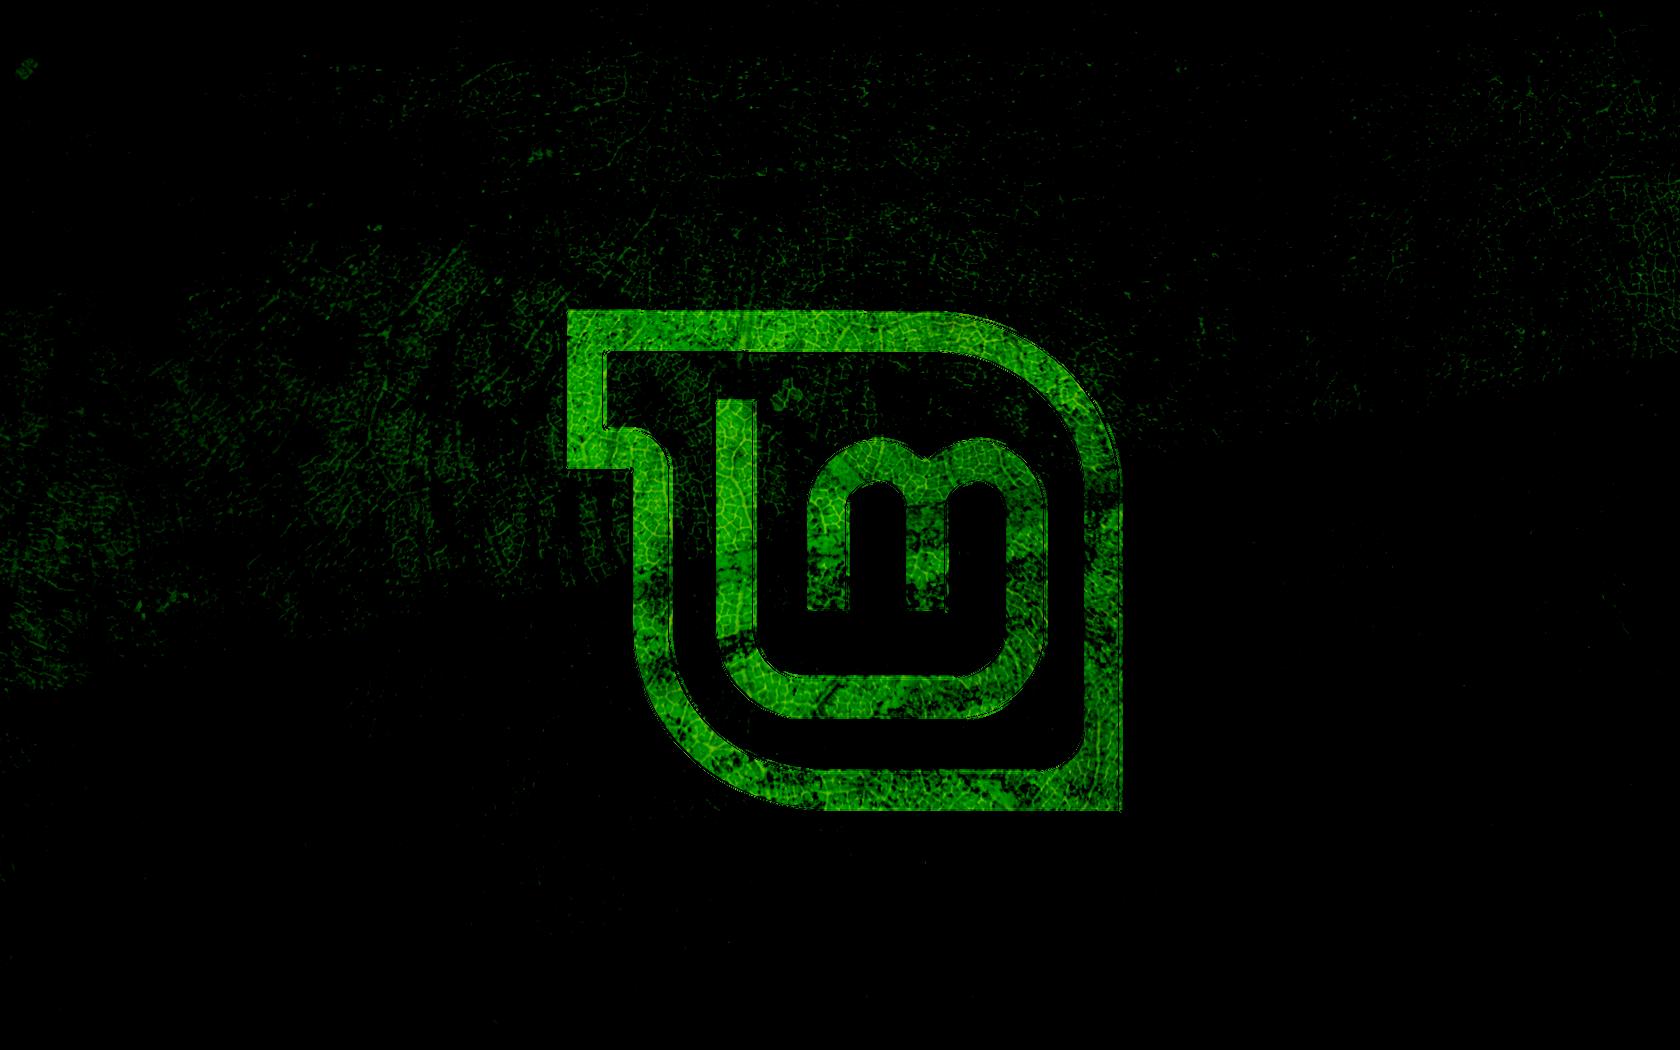 Linux Mint Wallpaper Linux mint wallpaper 1680x1050 1680x1050